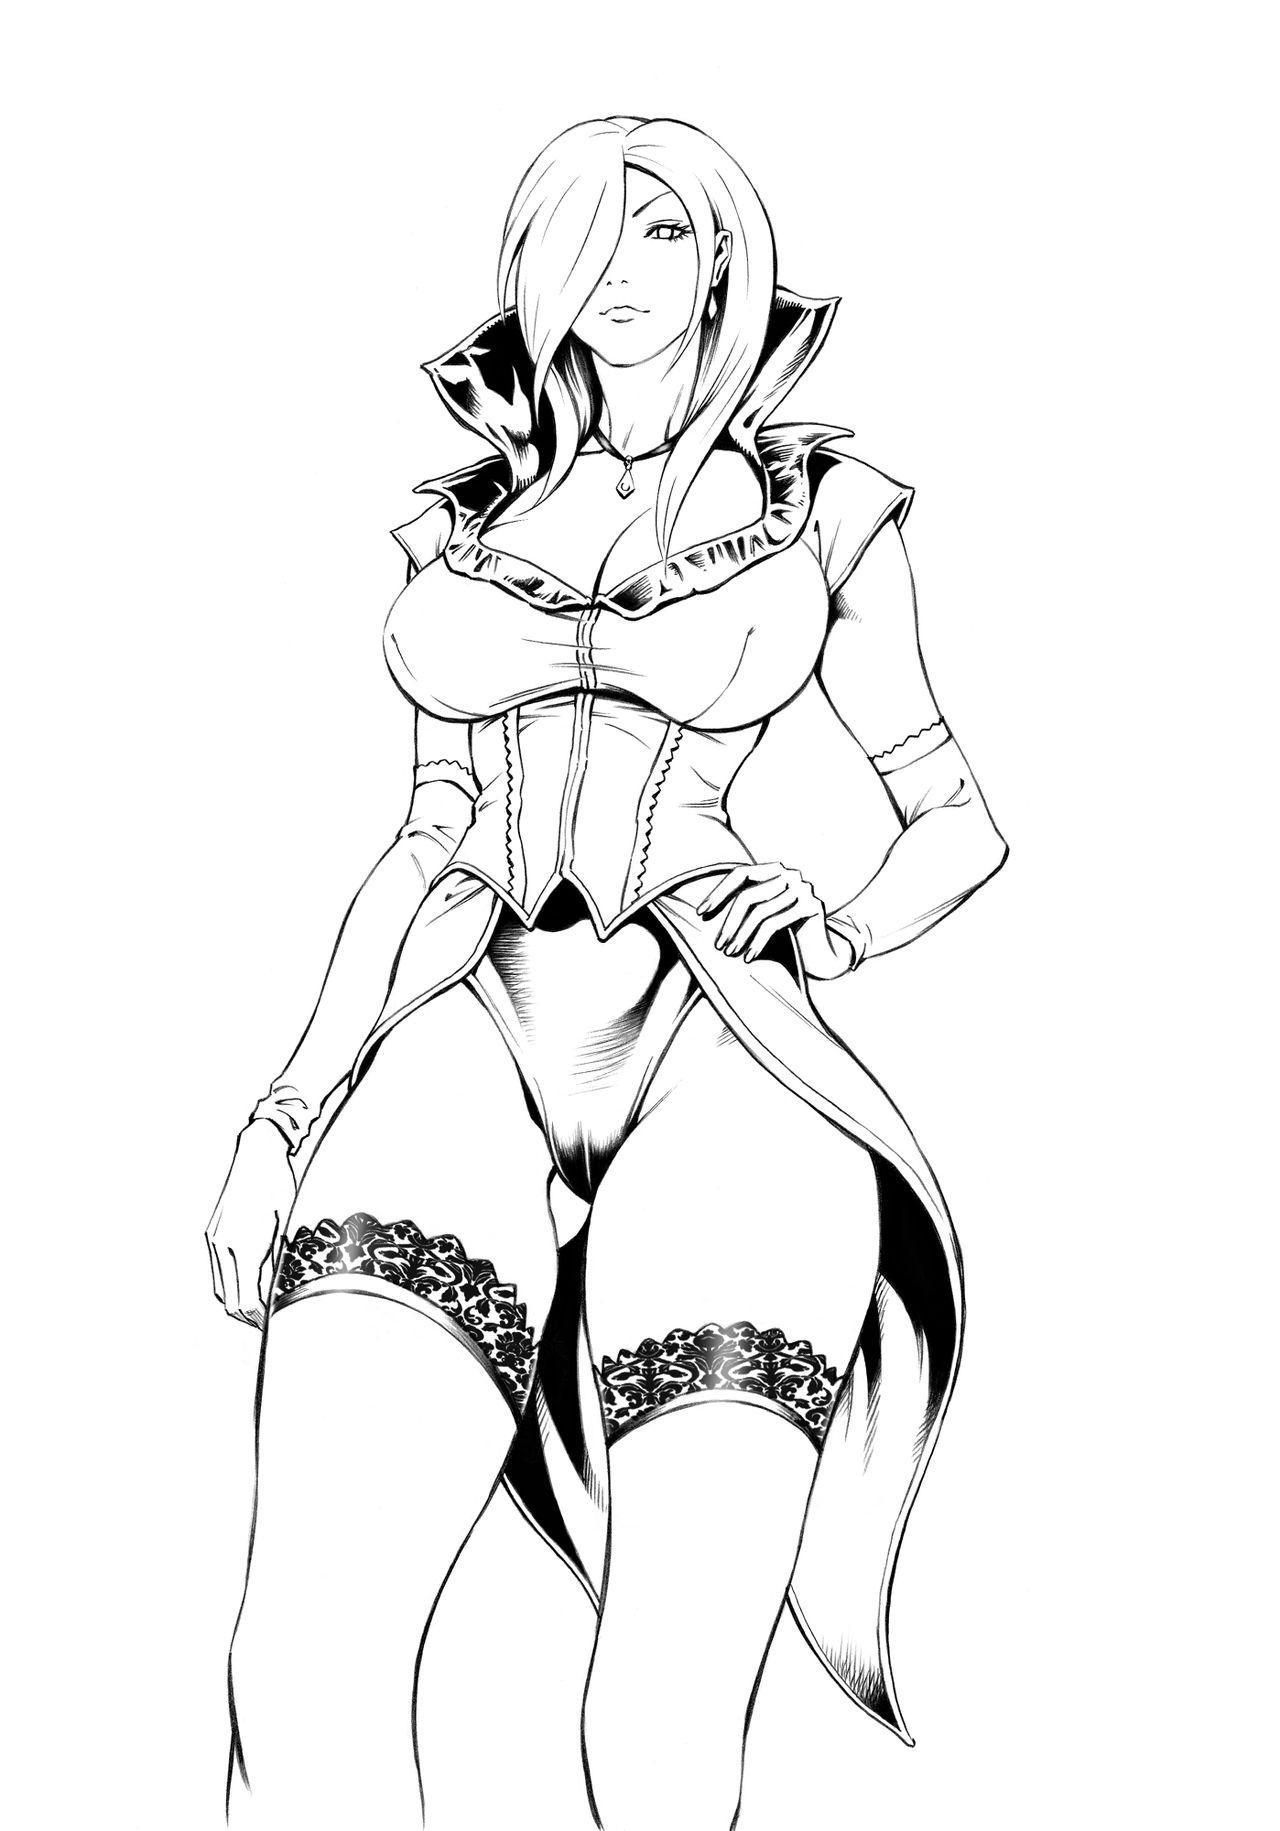 Aku no Onna Shuryou to Doutei Kouseiin | Evil Leader and the Virgin Members 51